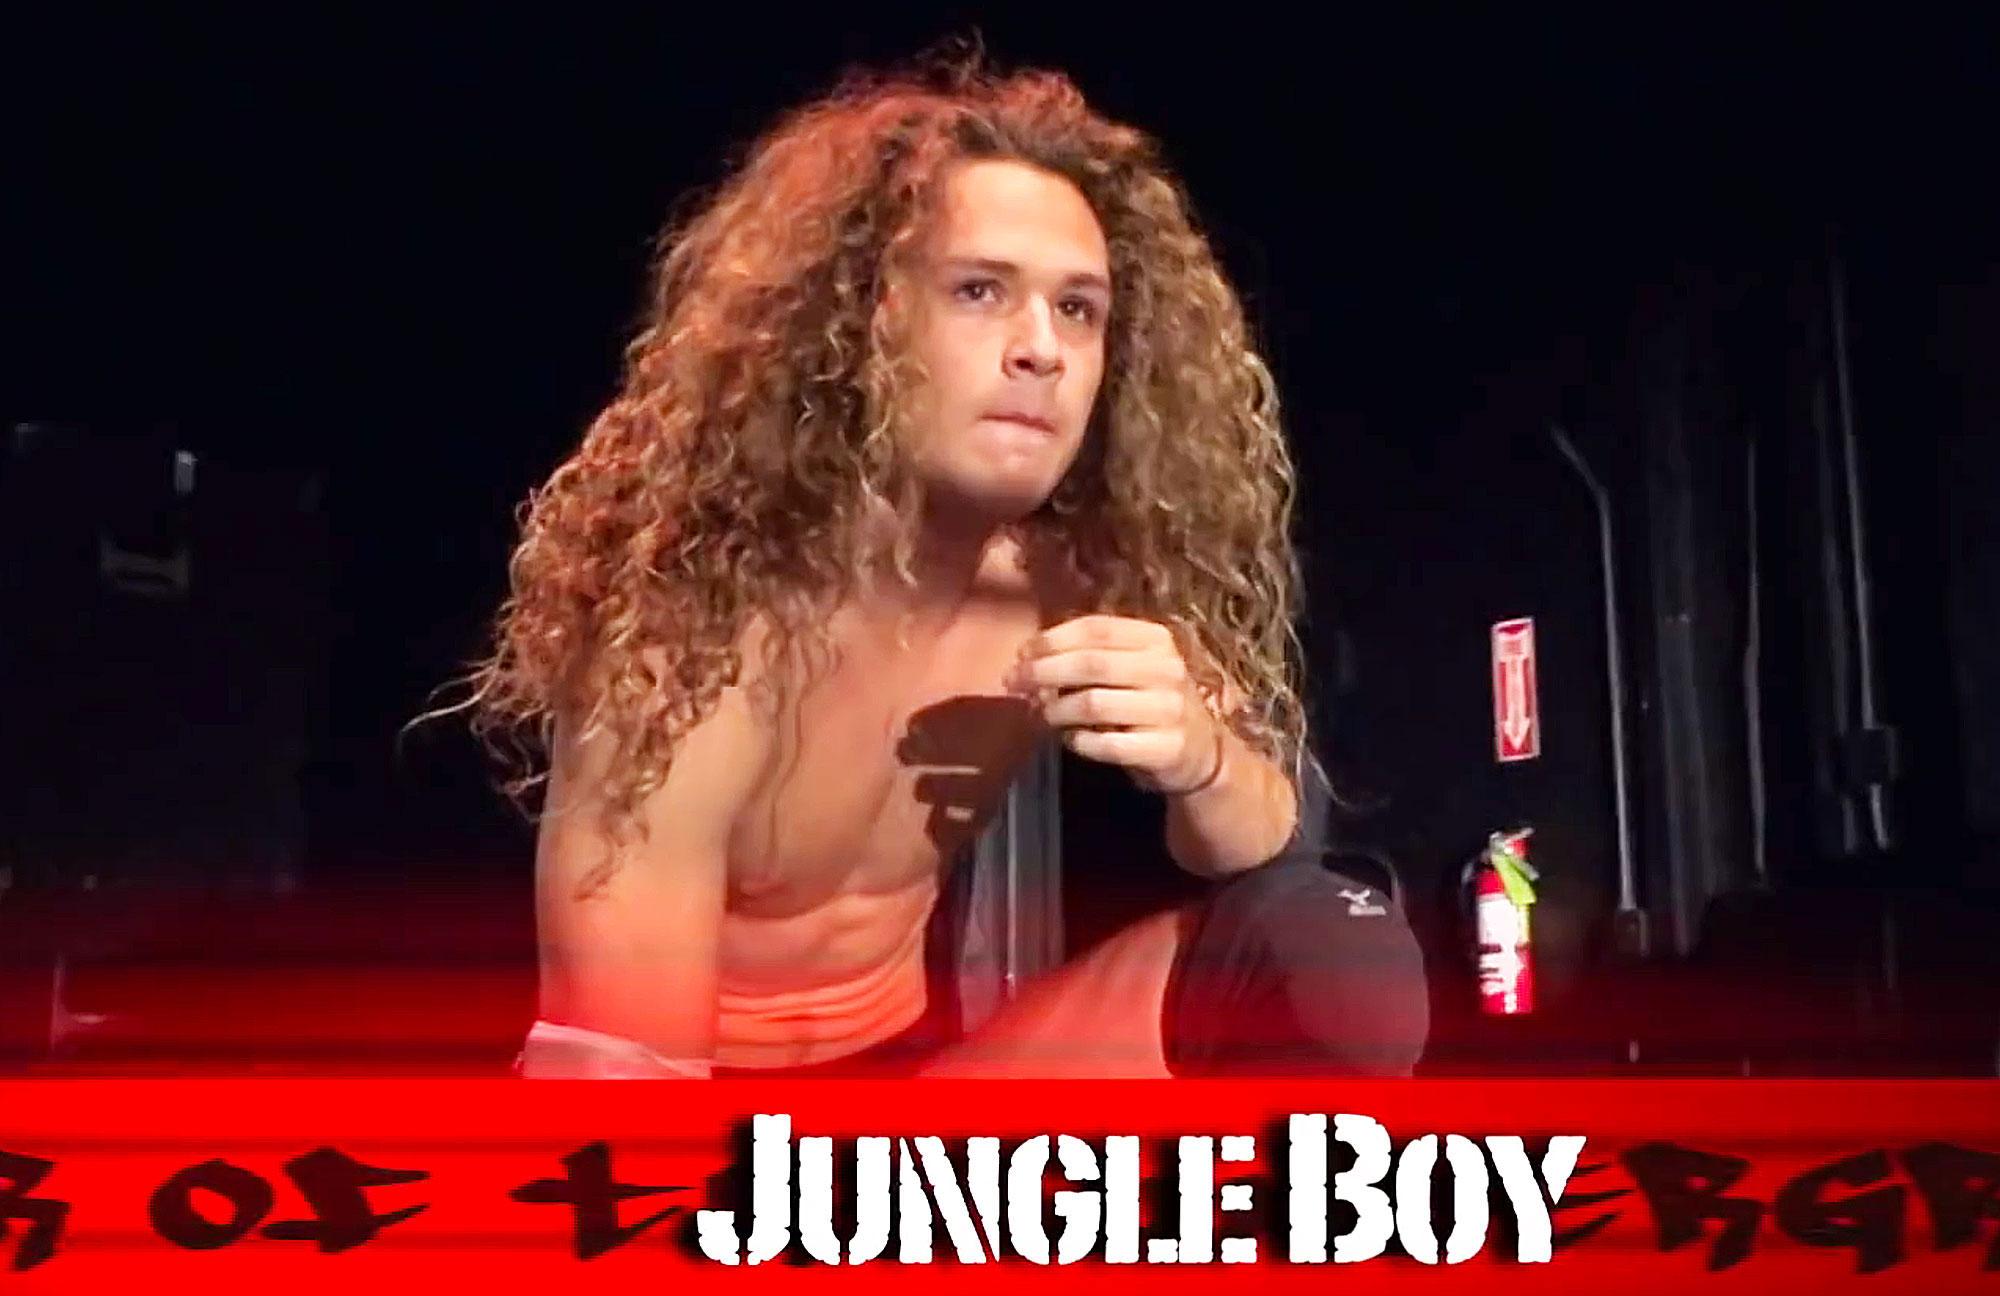 David Arquette Jungle Boy Luke Perry Son Tribute Wrestling Match